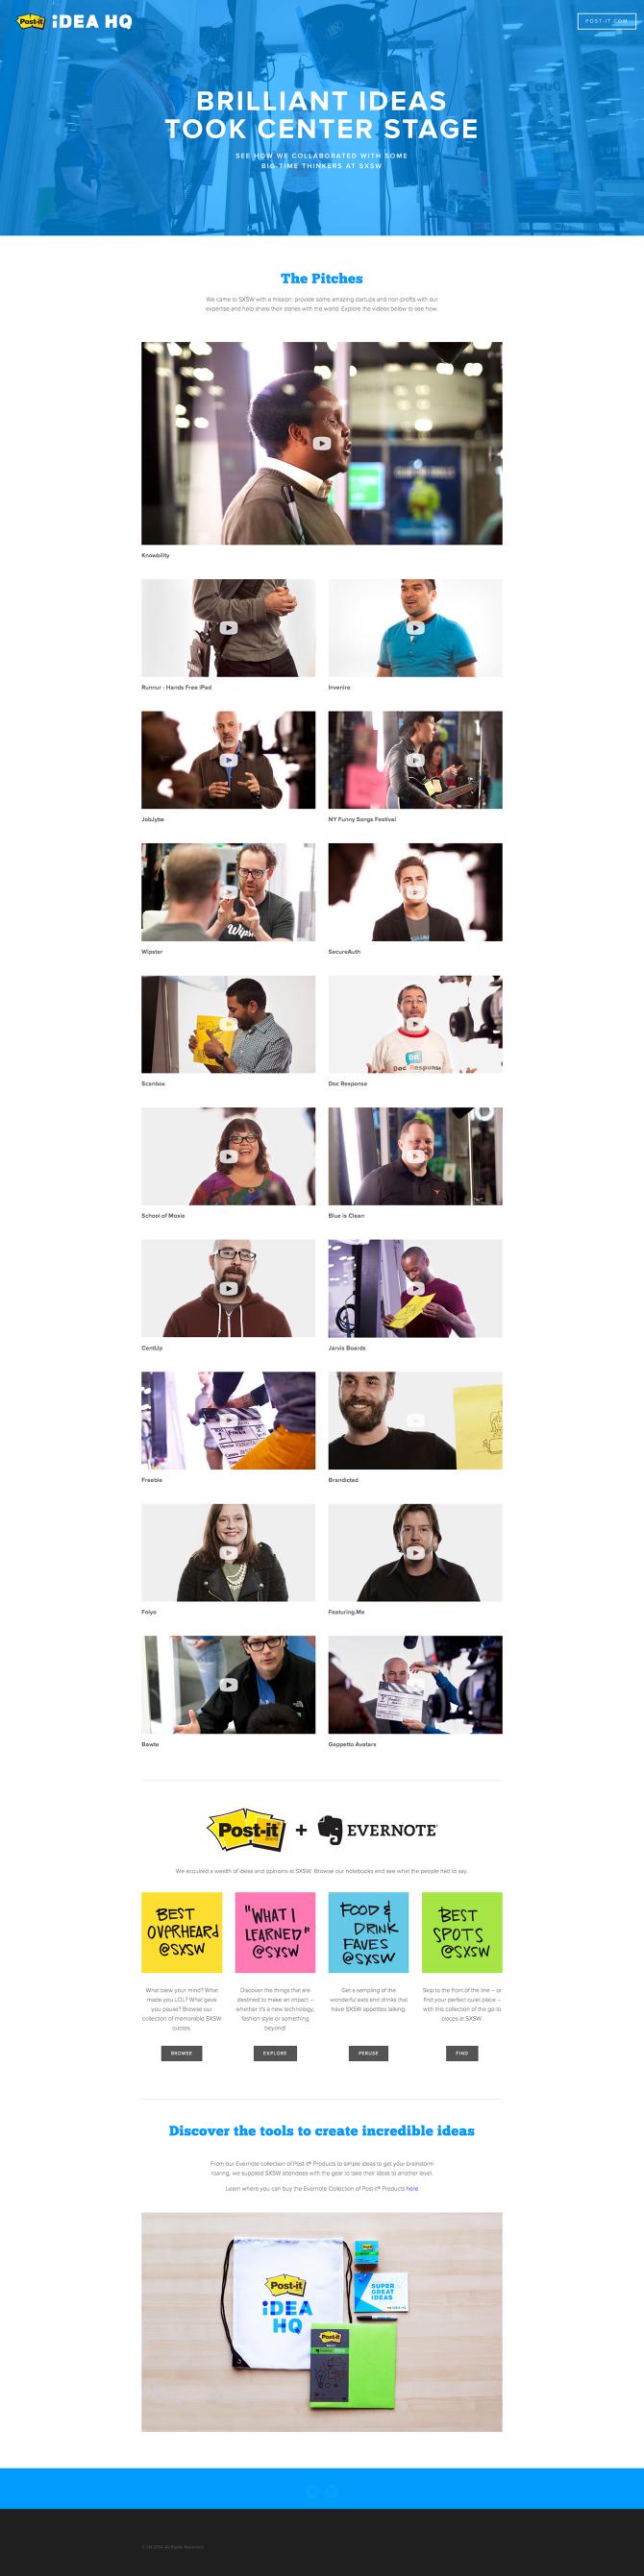 Post-it Idea HQ - Mike Rook